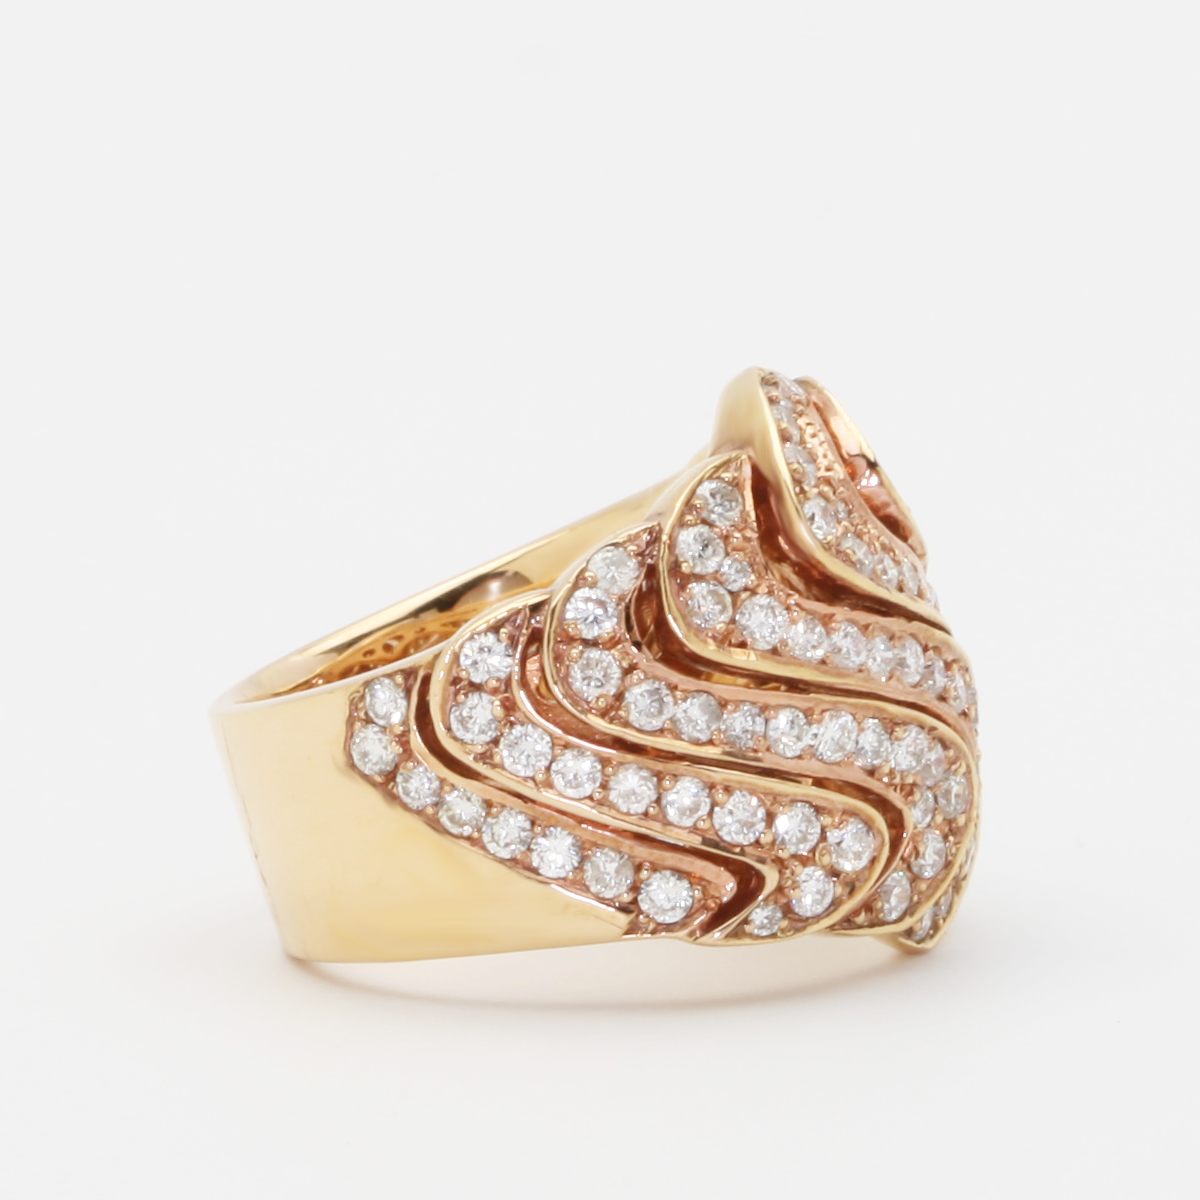 18K Pave Rose Gold And Diamond Swirl Ring - alternate